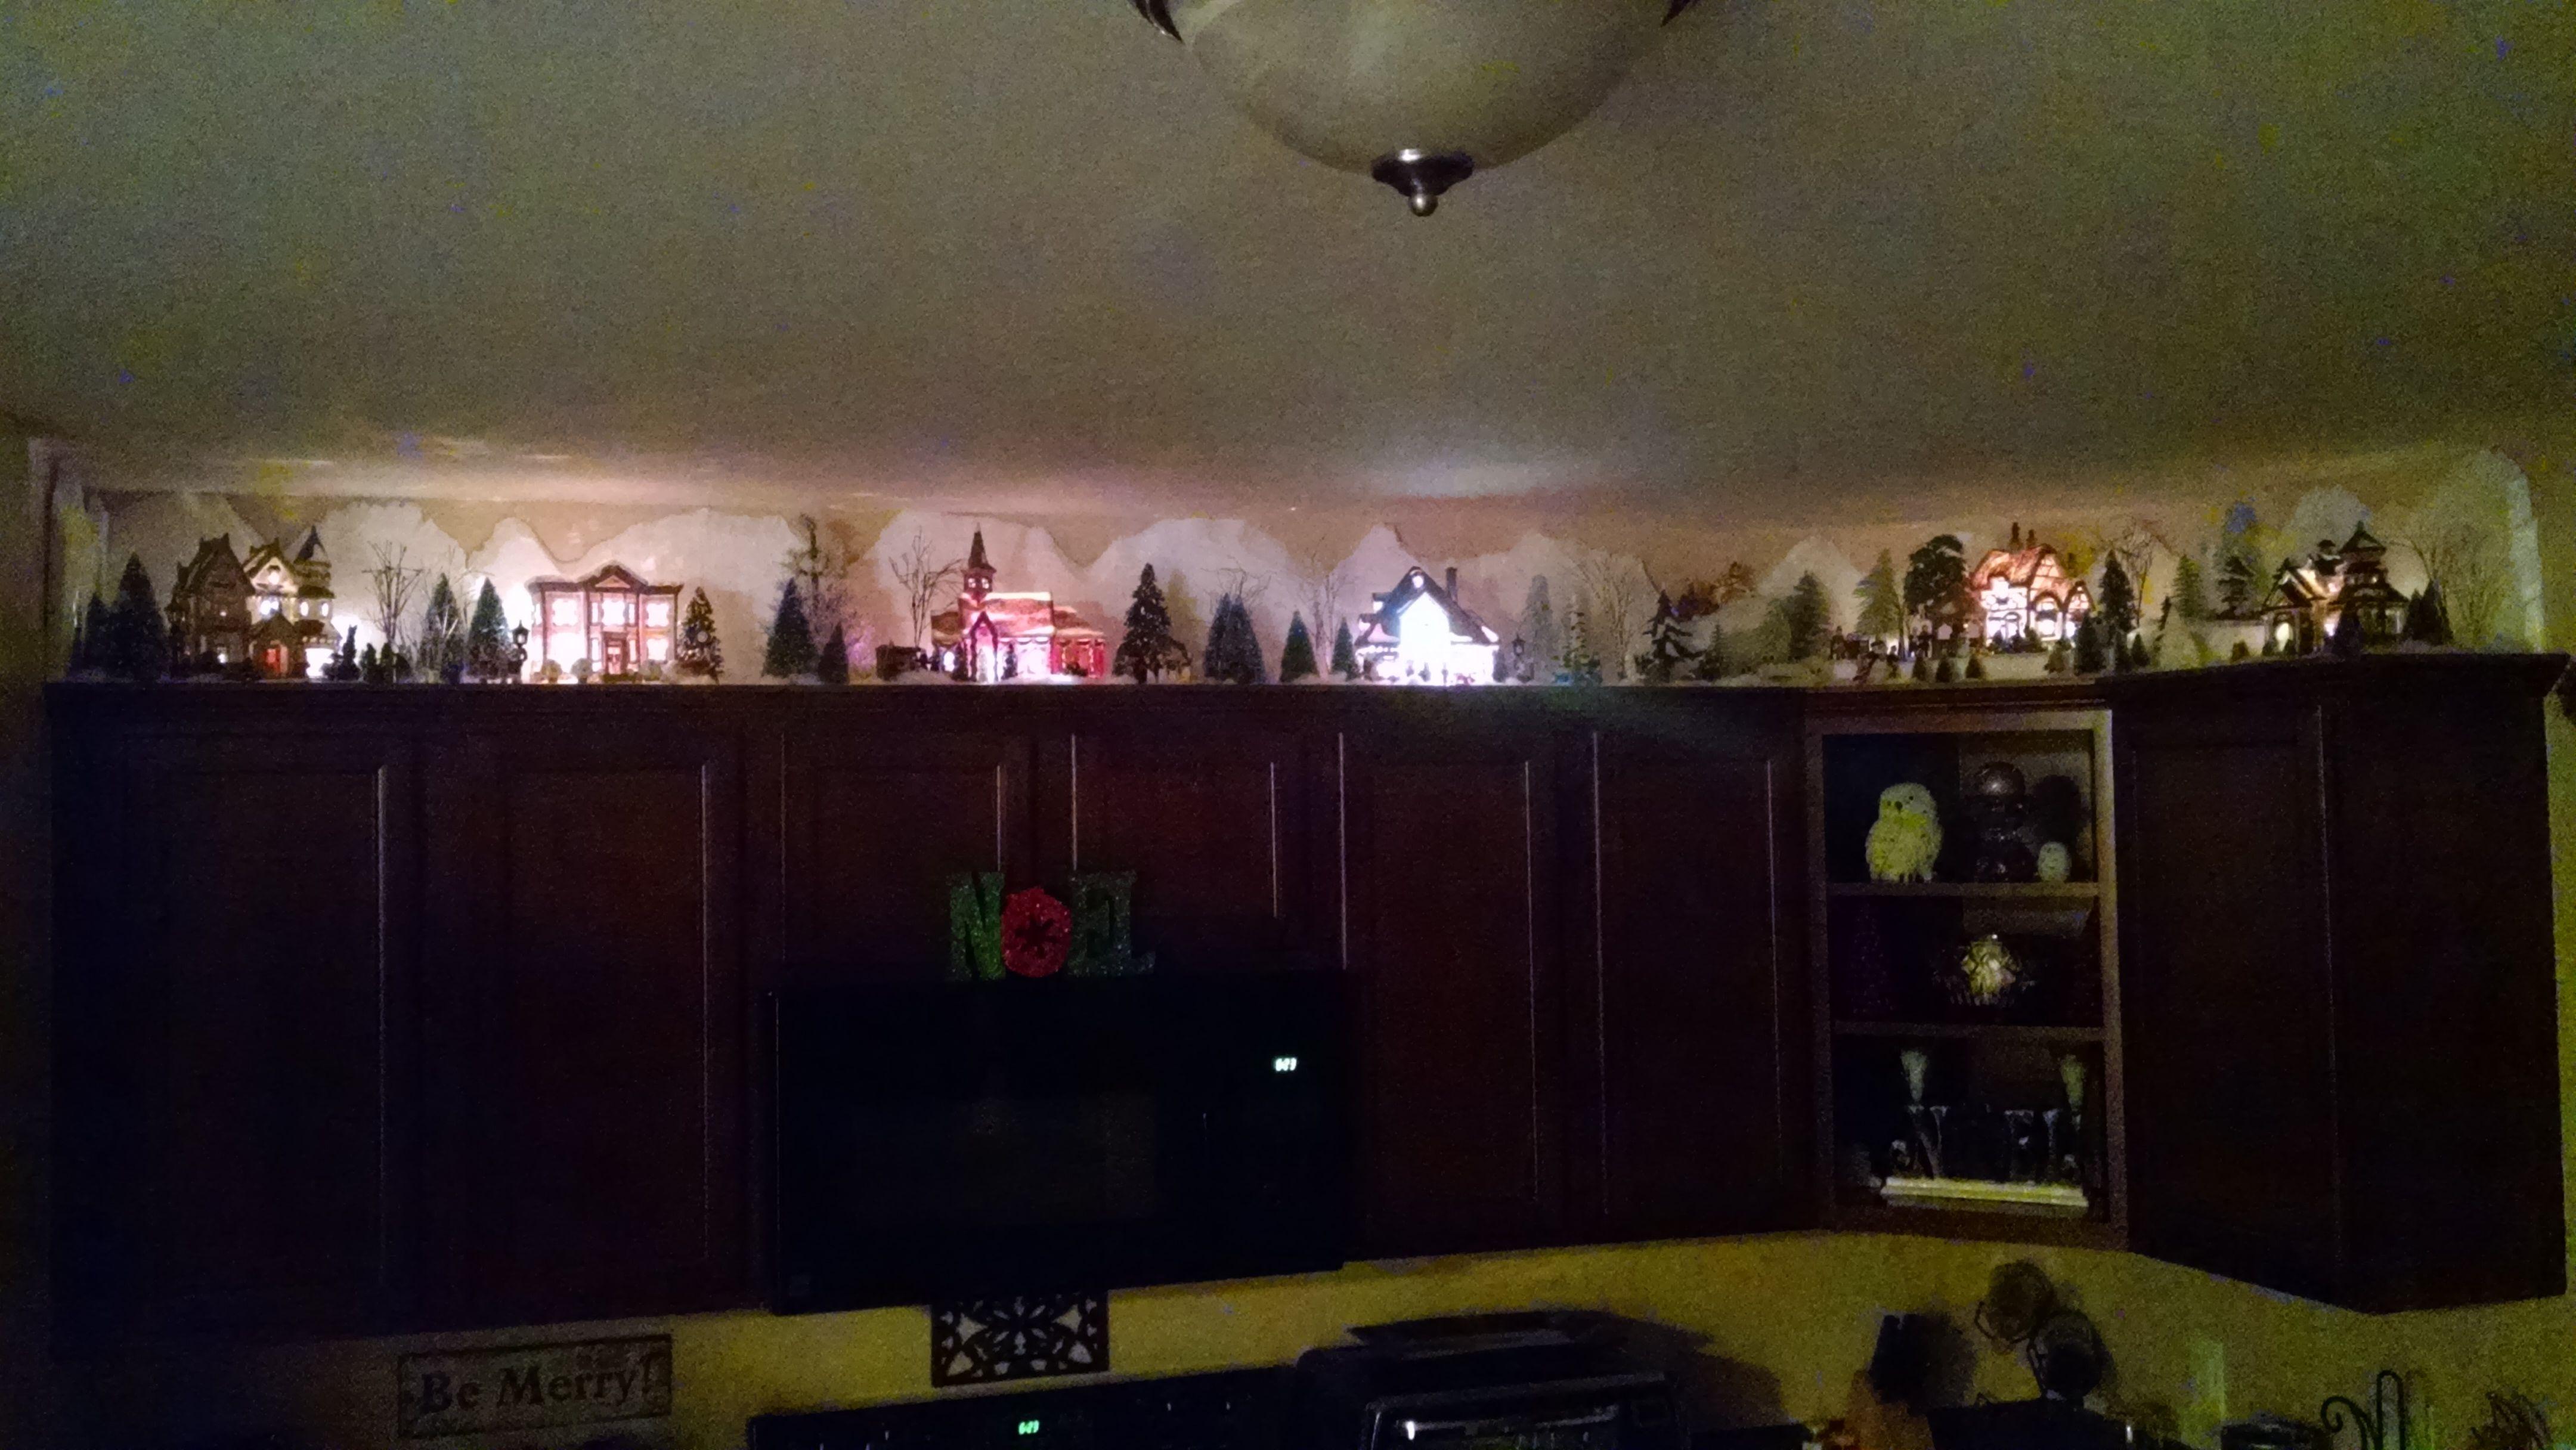 Christmas Village Above Kitchen Cabinets Holiday Diy Projects Christmas Aesthetic Christmas Villages